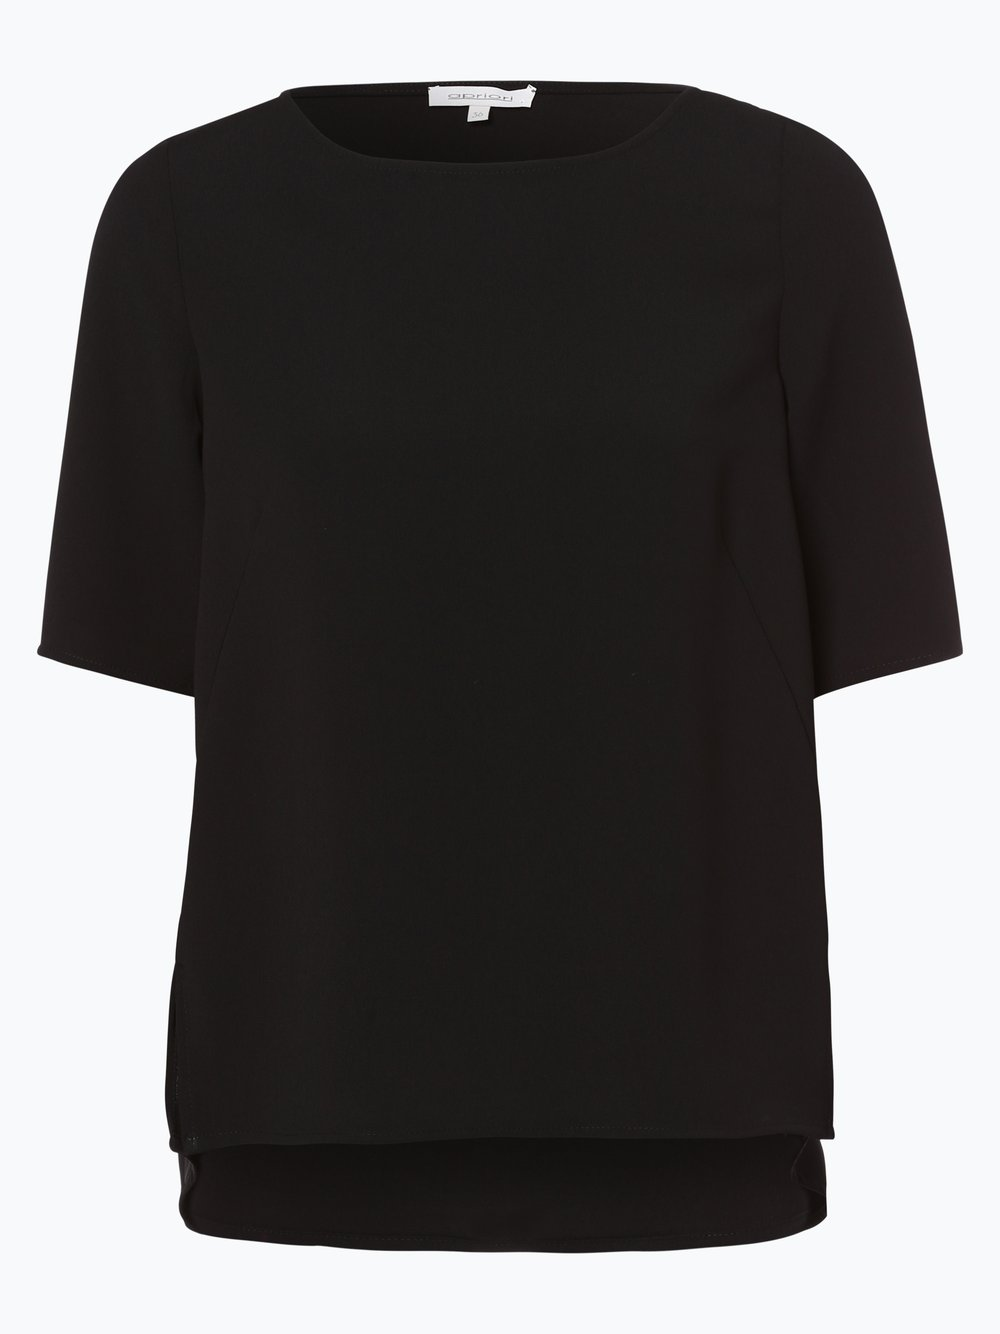 Apriori – Bluzka damska, czarny Van Graaf 382414-0001